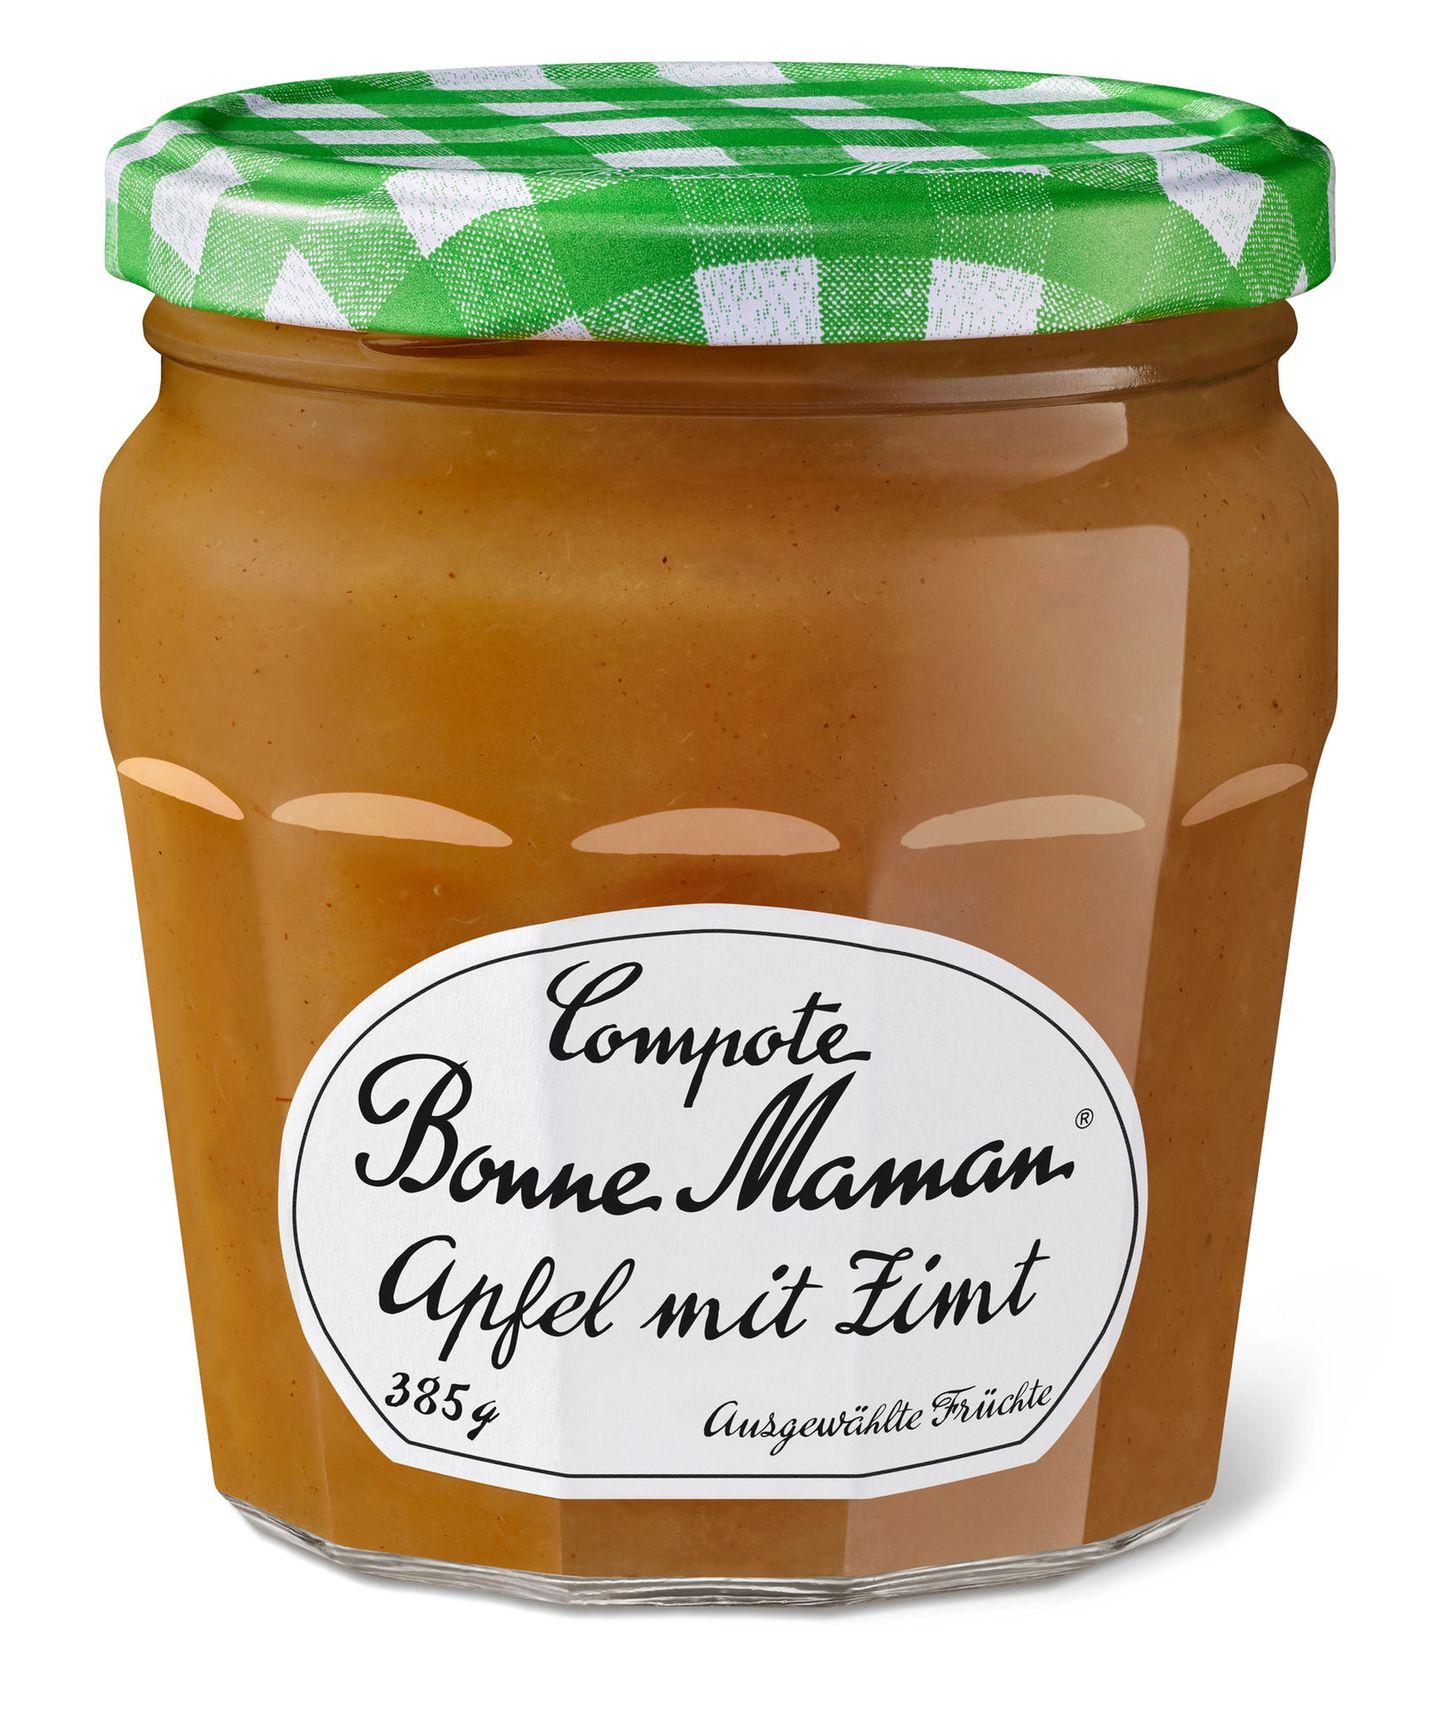 Food News: Bonne Maman Compote